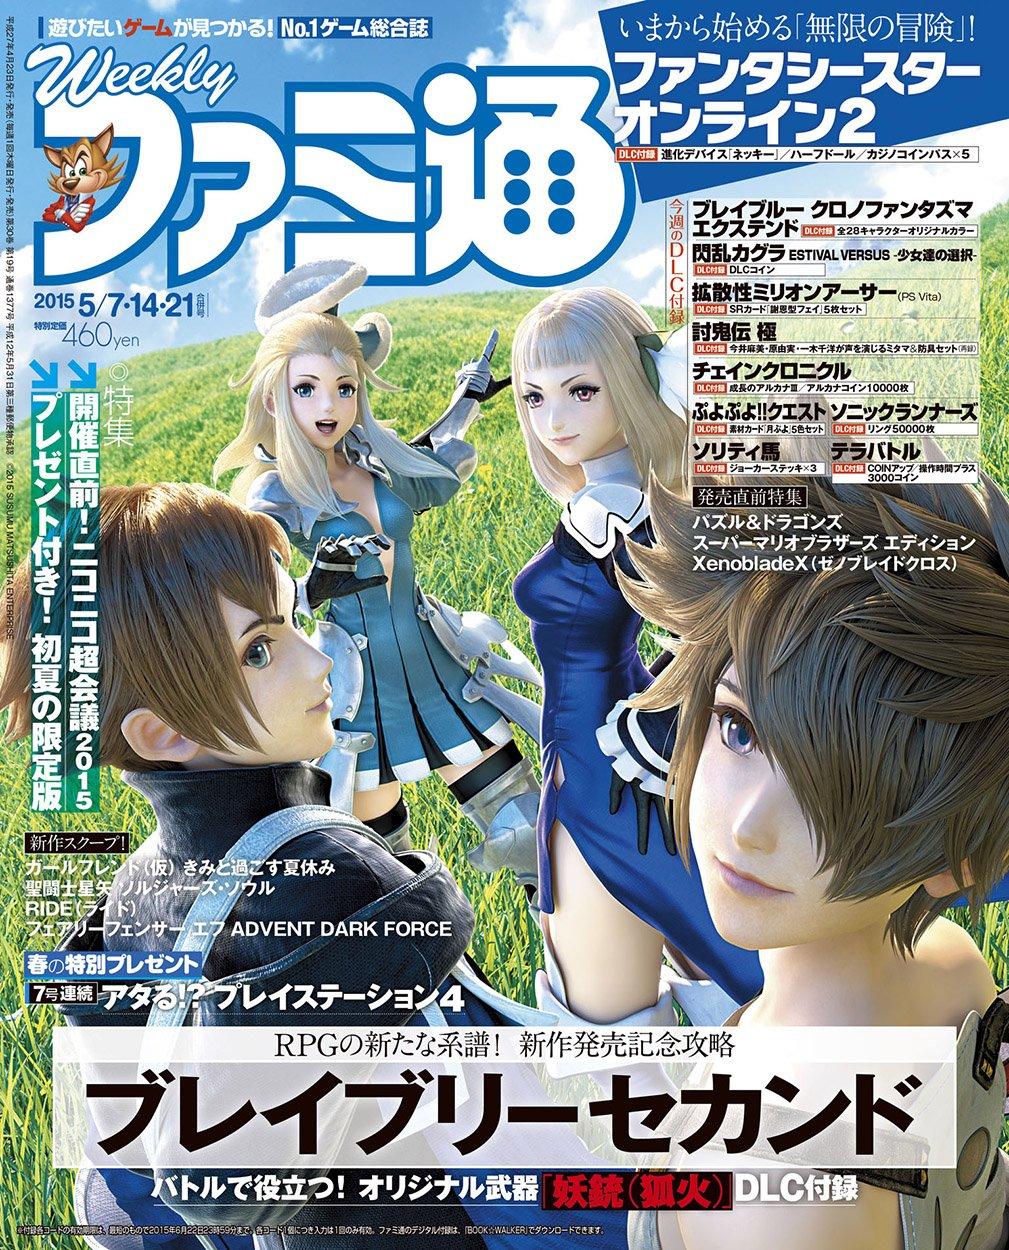 Famitsu 1377 May 7,14,21, 2015